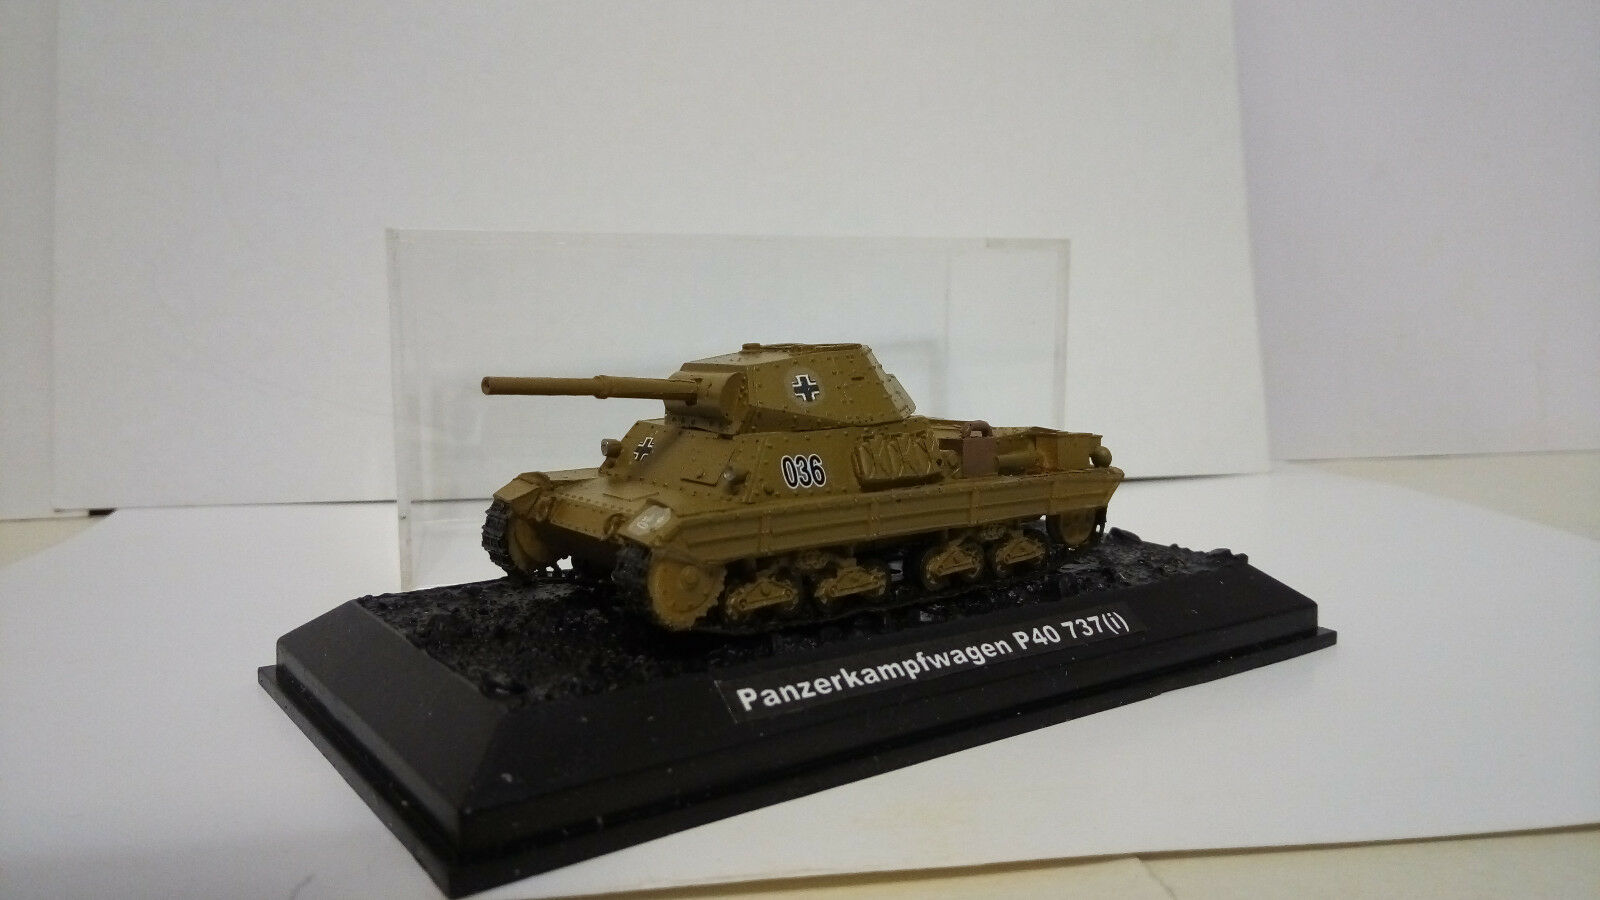 Panzerkampfwagen p40 737 (I) (1 72) resin